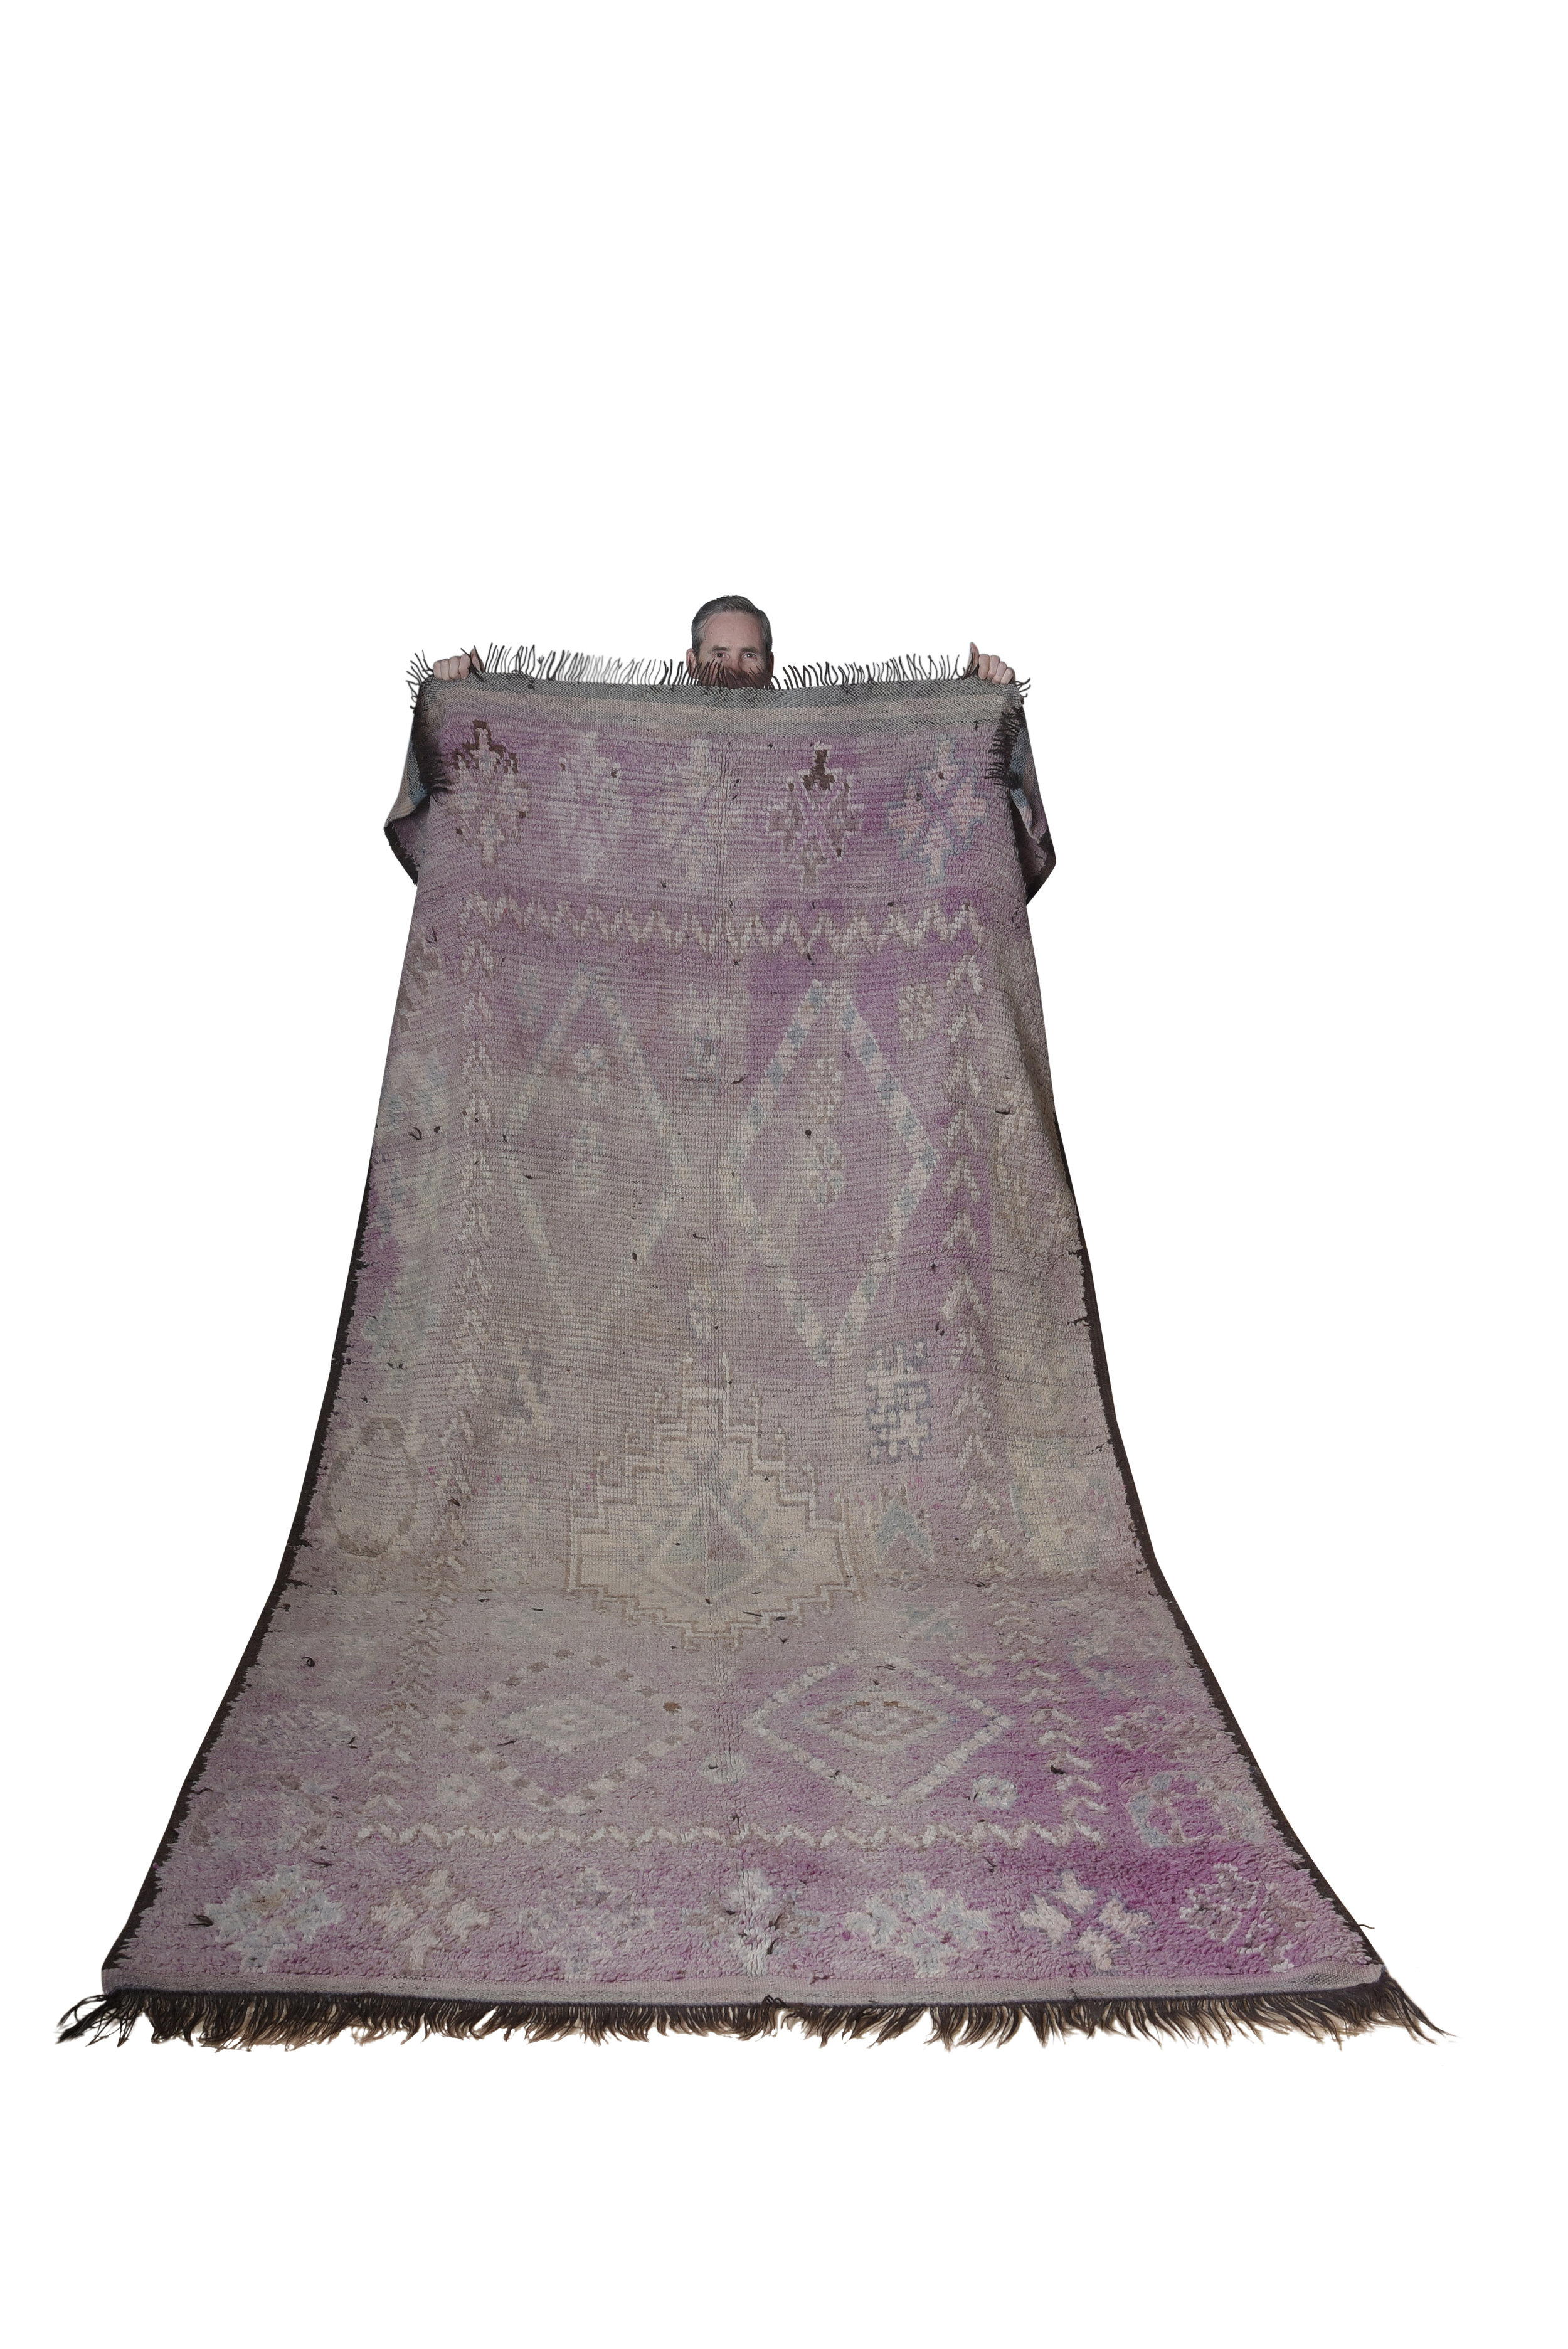 Large Vintage Moroccan Tribe Rug $100